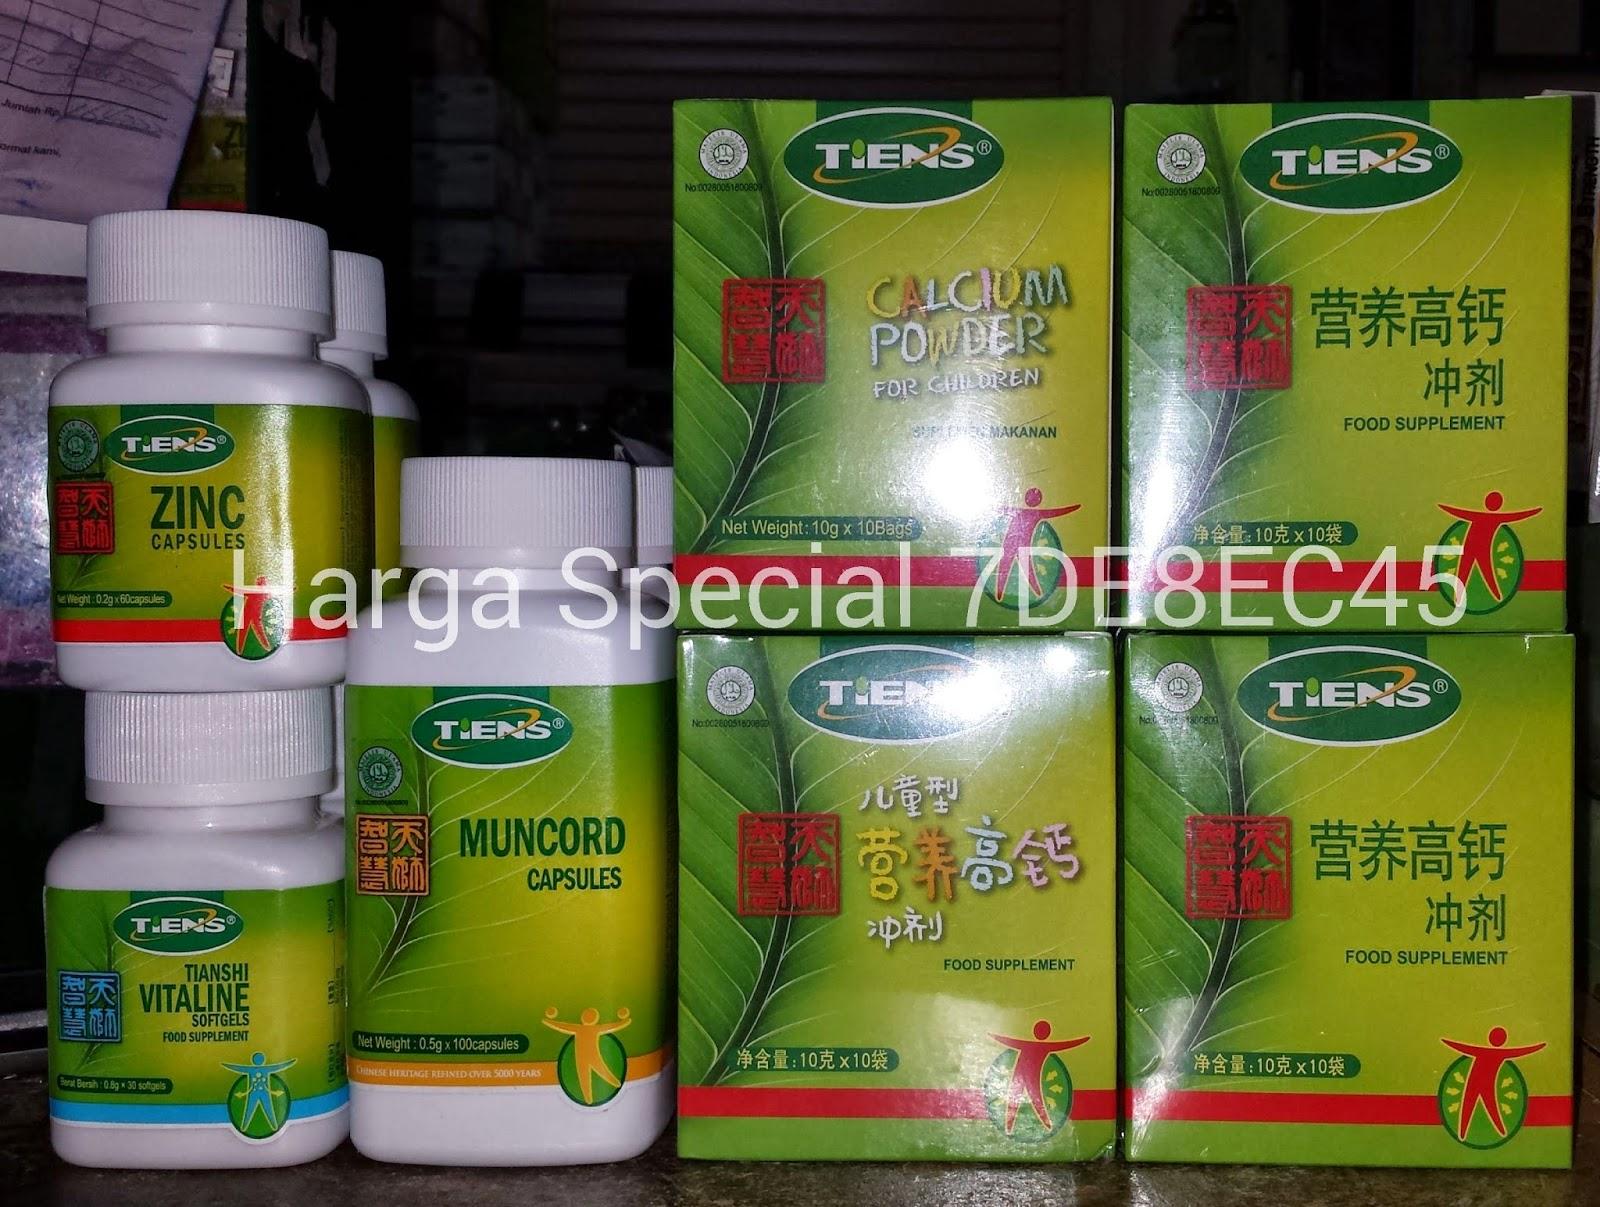 Paket Peninggi Badan Tiens Kalsium Nhcp Zinc Capsules Harga Original 2box 1botol Special Discount Rp145000